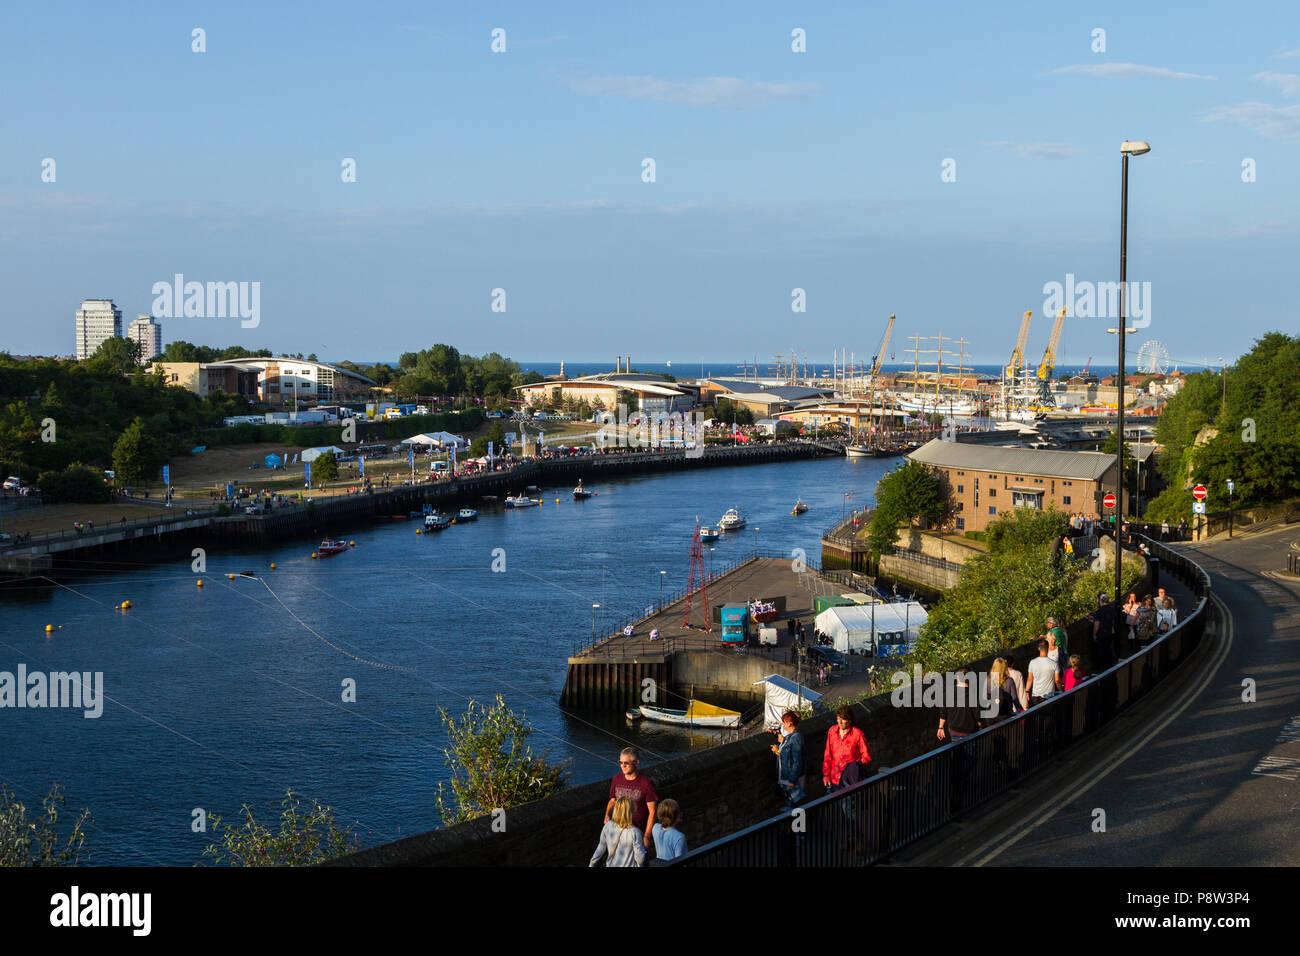 Sunderland, UK, 13 July 2018. Ships on display at the Tall Ships Race, Sunderland 2018 - Stock Image